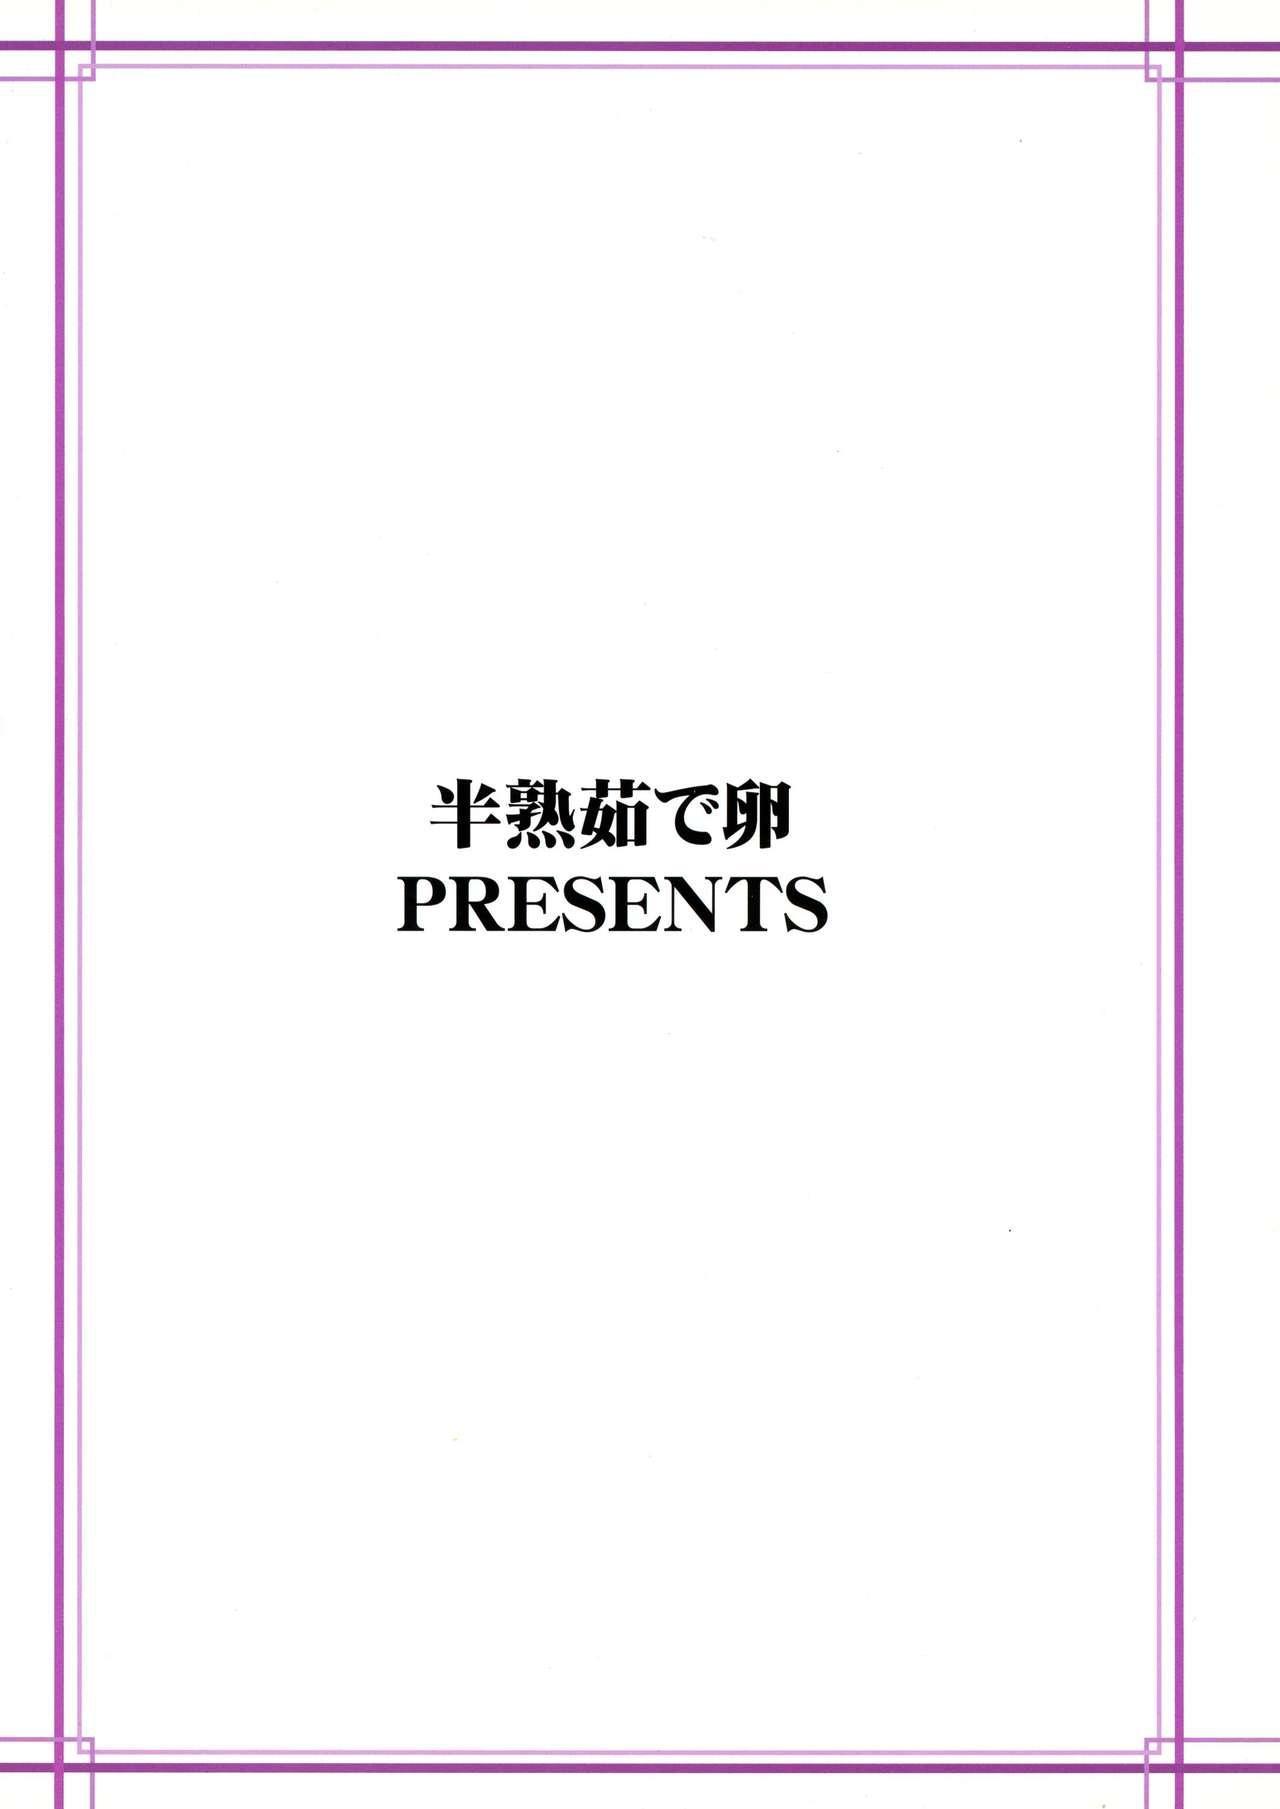 Kyouki Vol. 3~5 Remake Ver. 1